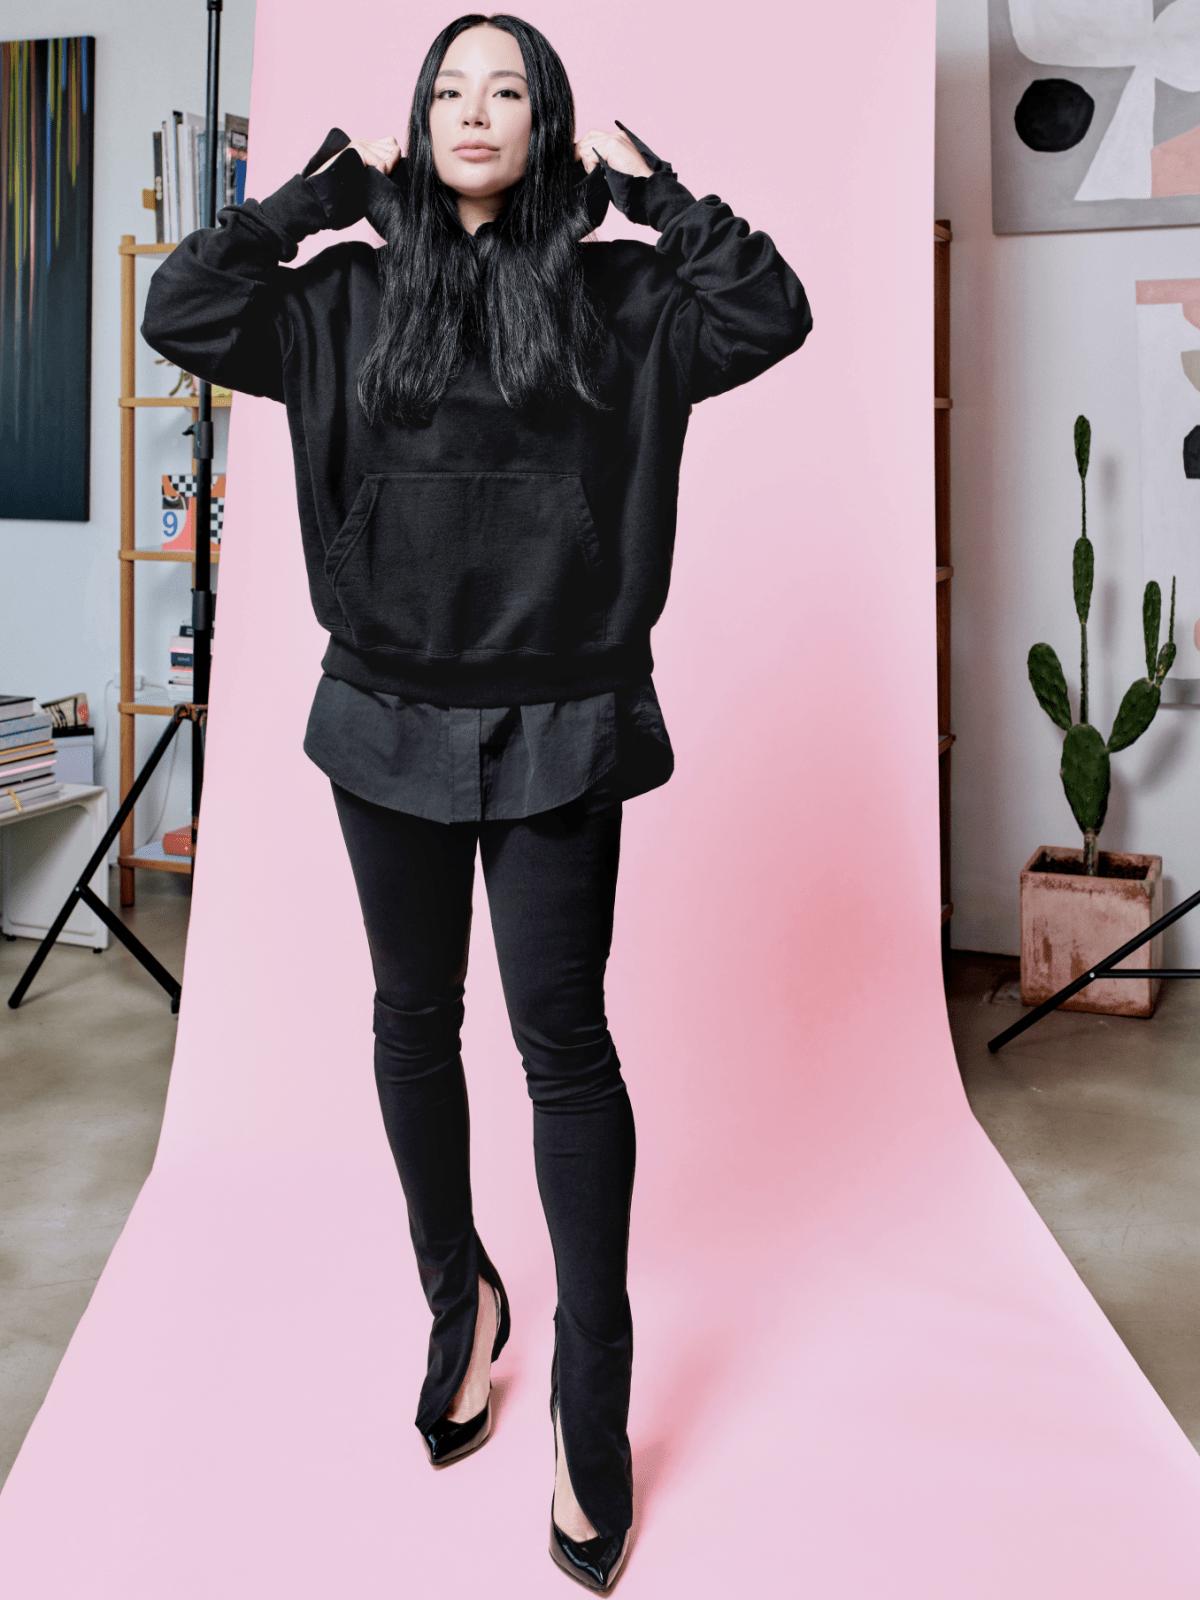 Woman standing pulling up the hood of her sweatshirt